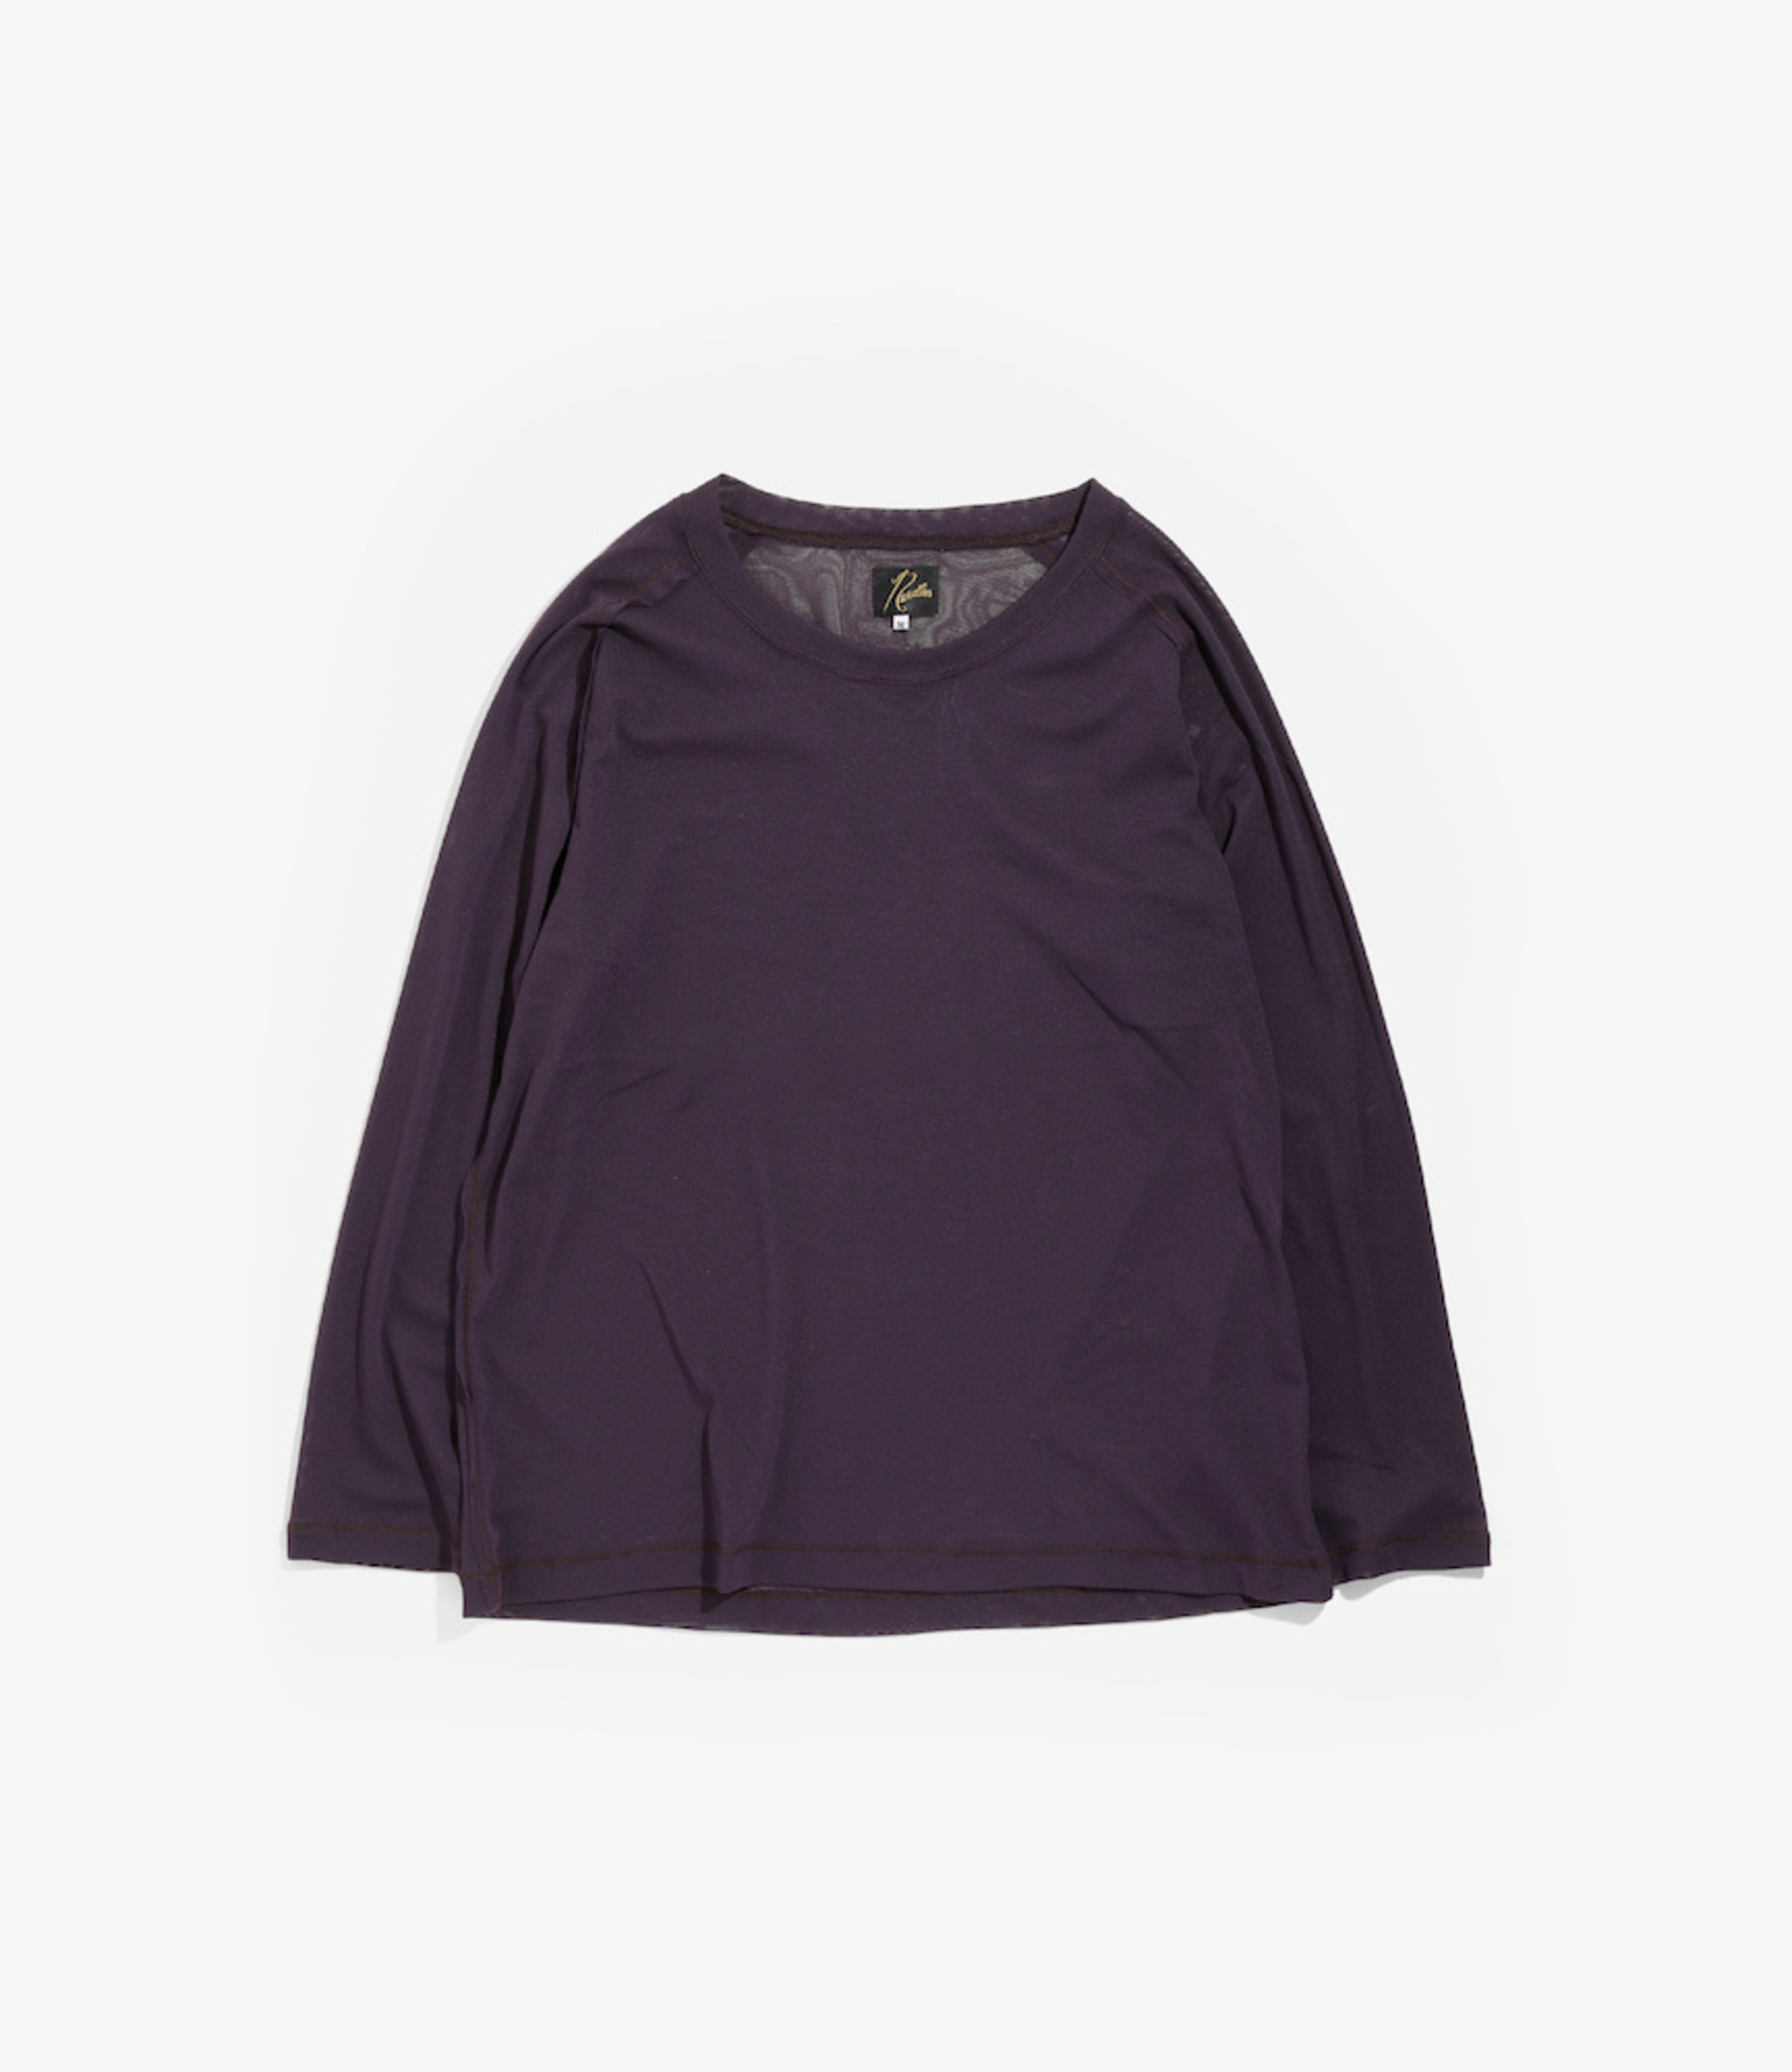 Needles L/S U Neck Tee - Poly Jersey - Purple